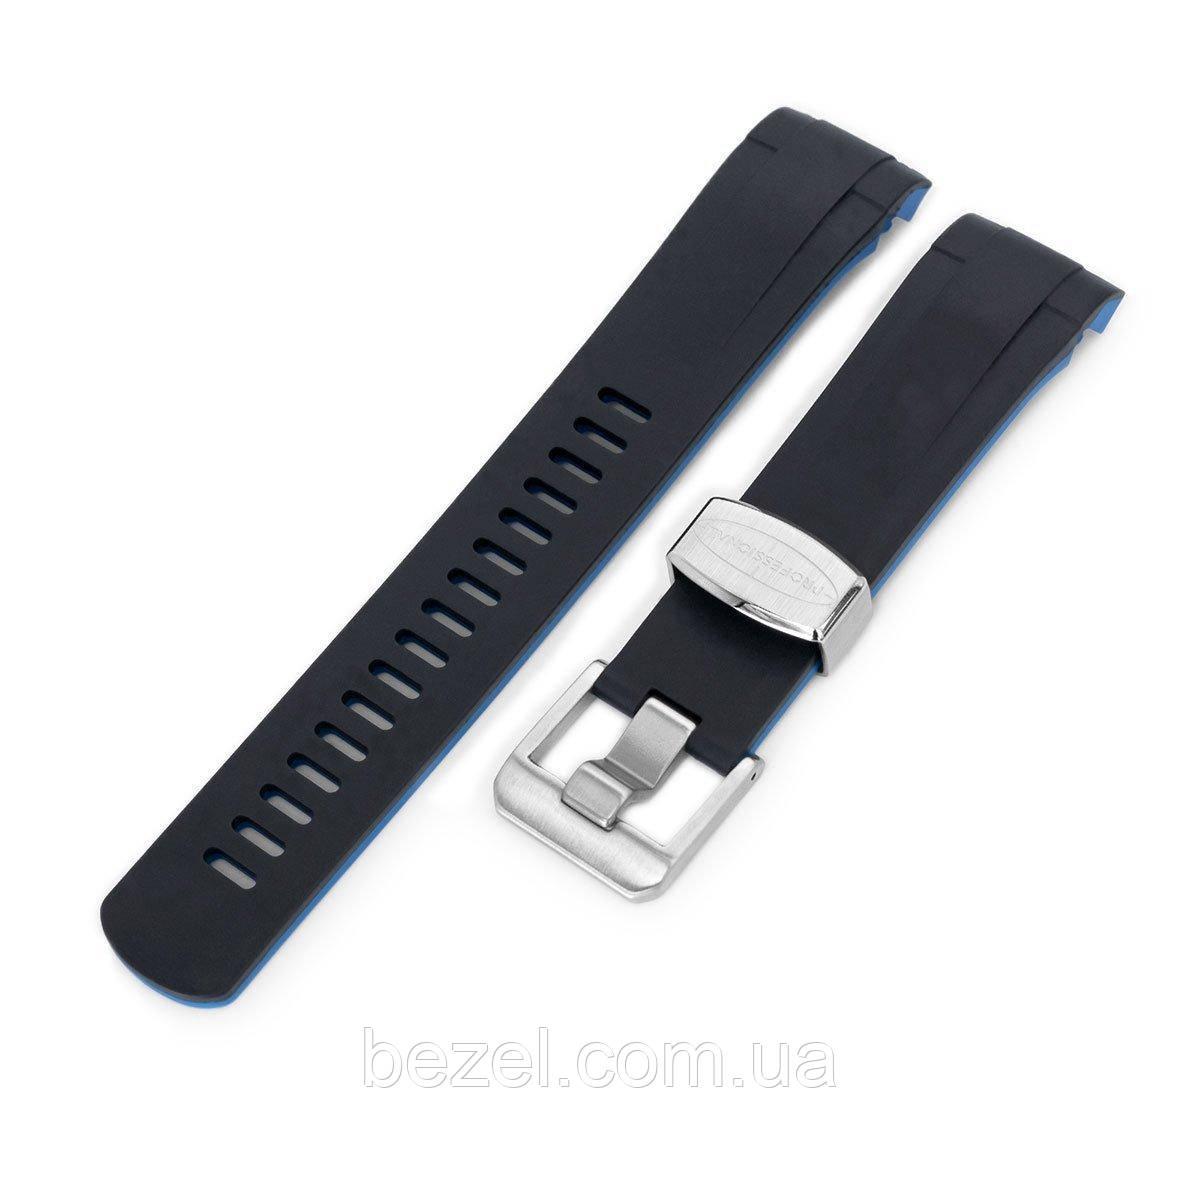 22mm Crafter Blue - Dual Color Black , Blue Rubber Curved Lug Watch Strap for Tudor Black Bay M79230